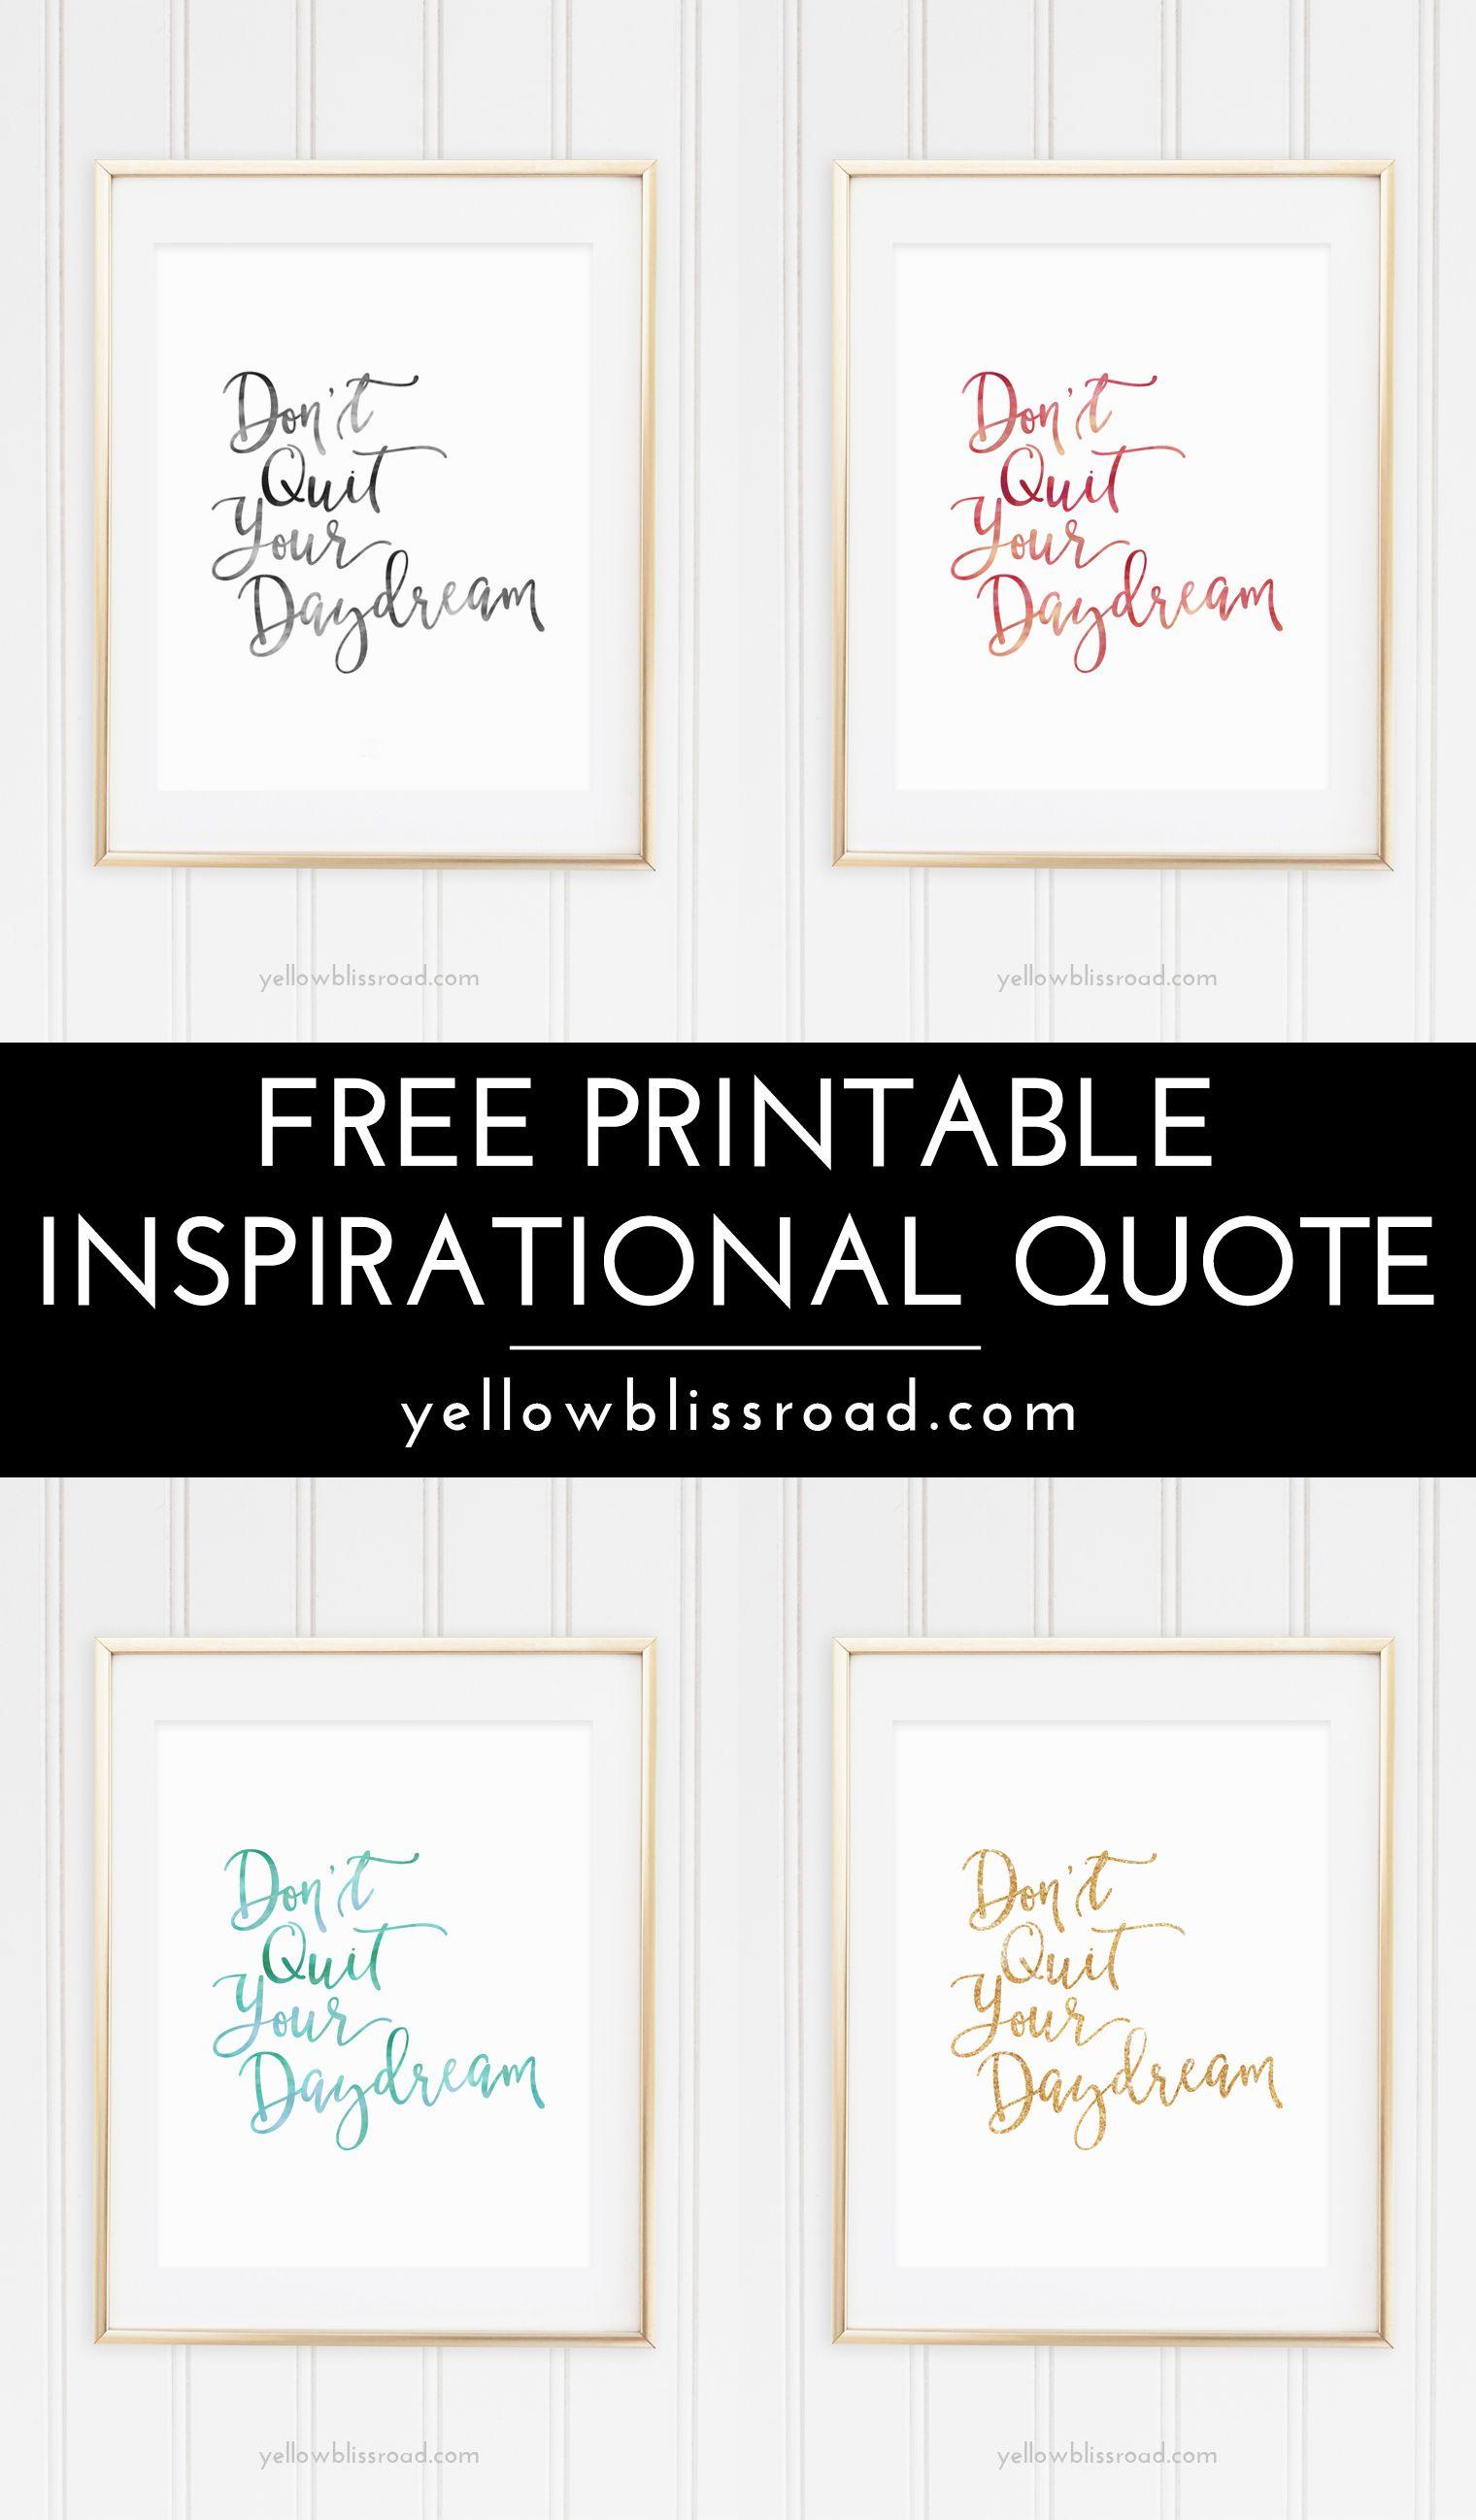 Free Inspiration Quote Printable   Free Printable Wall Art, Quotes - Free Printable Wall Art Quotes